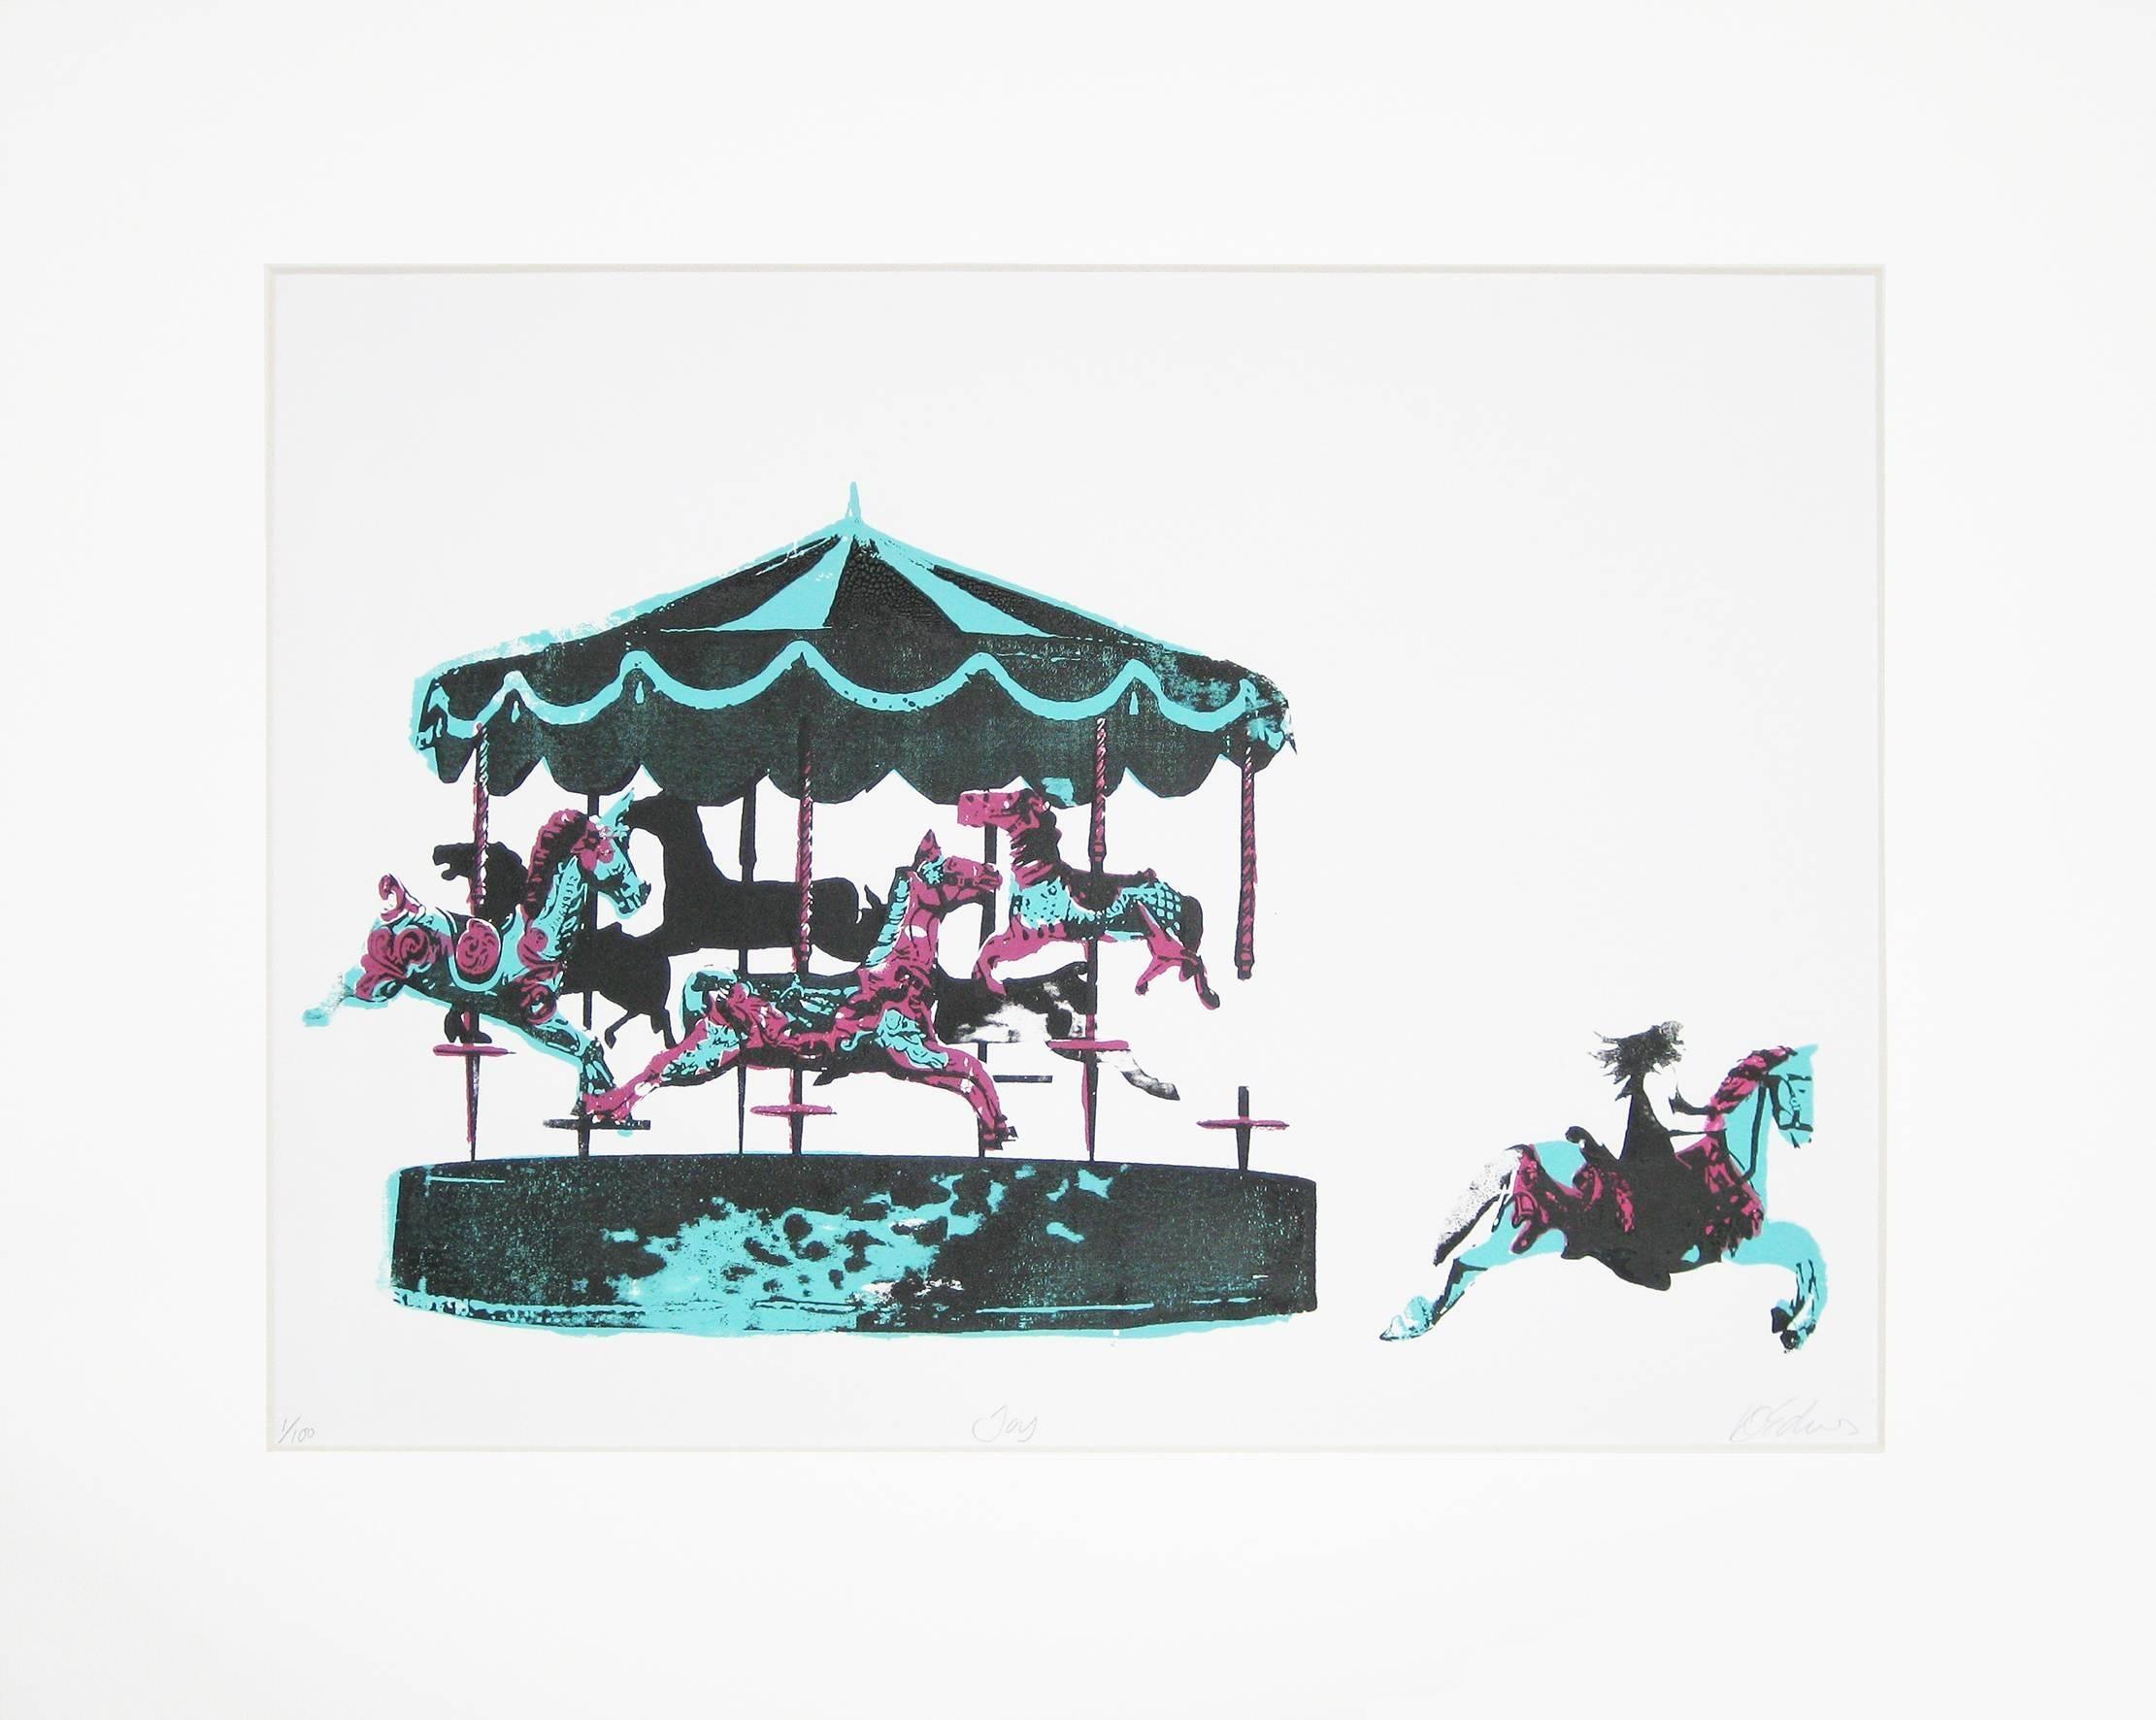 Joy, Katie Edwards, Limited Edition Print, Happy Art, Street Art, Bright Prints